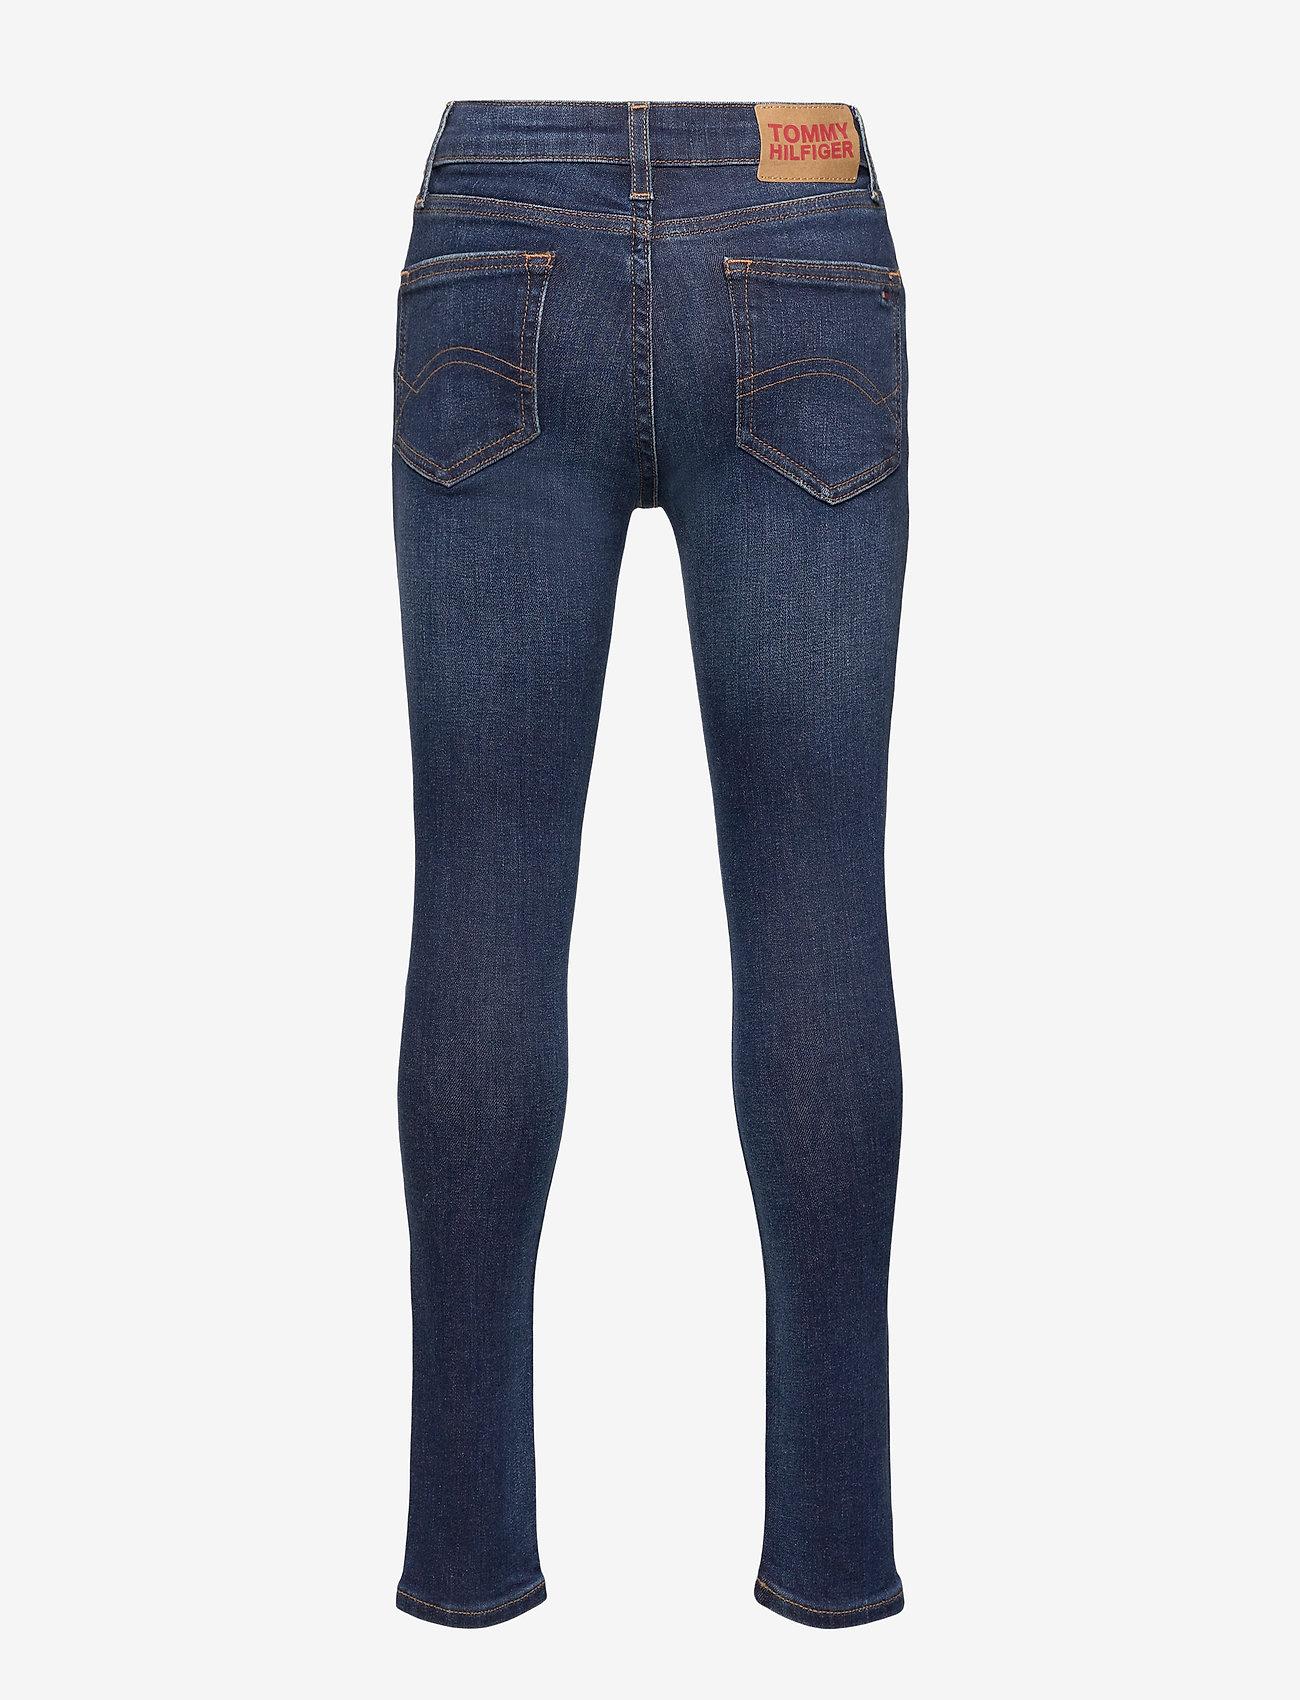 Tommy Hilfiger - NORA SUPER SKINNY DK - jeans - darkcobaltbluestr - 1